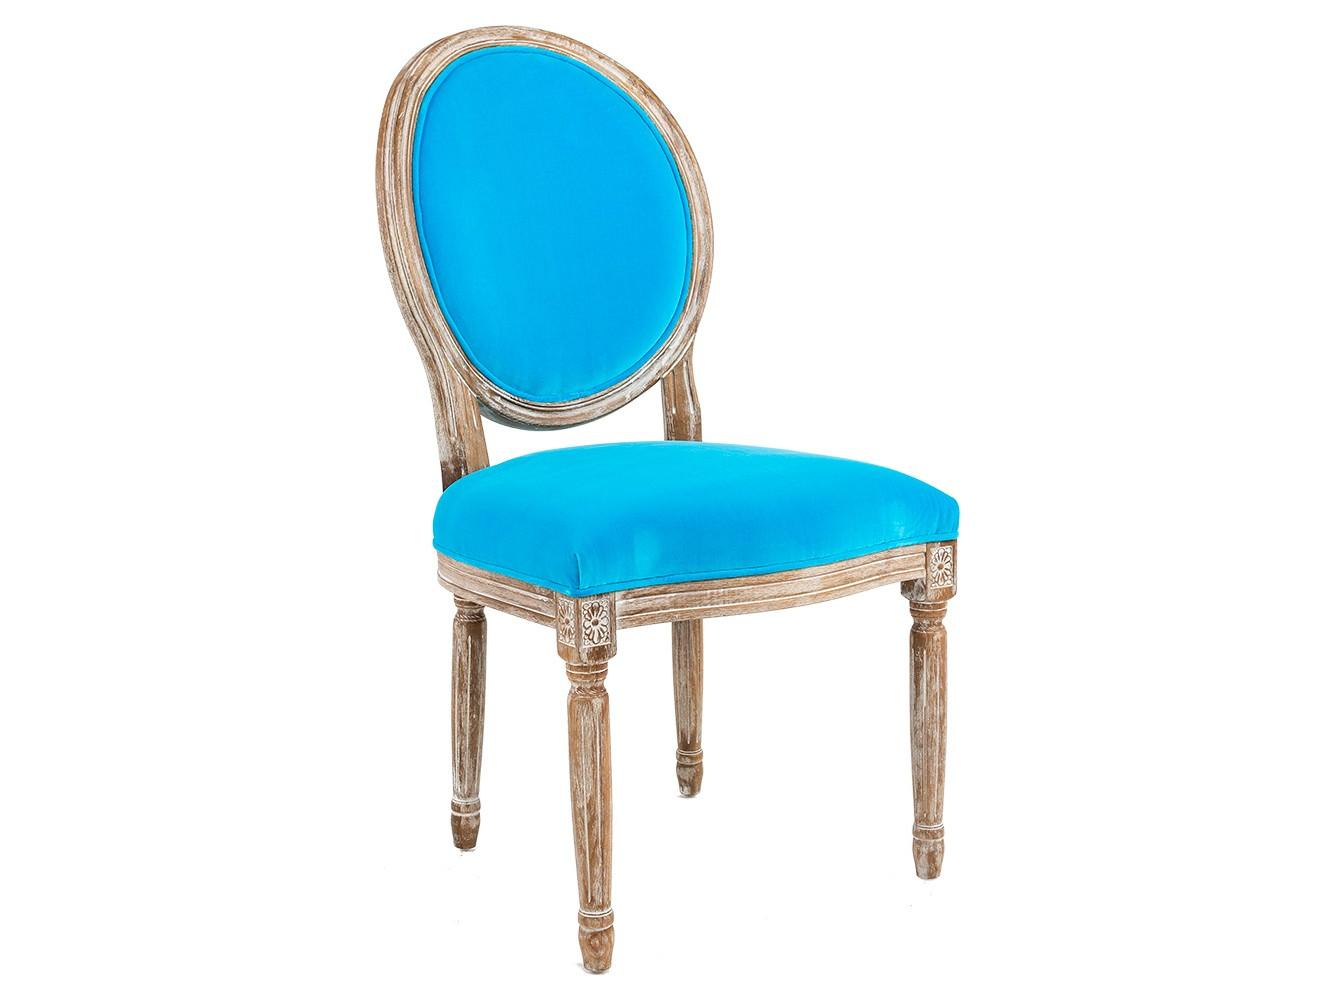 Кухонный стул Object Desire 15438276 от thefurnish